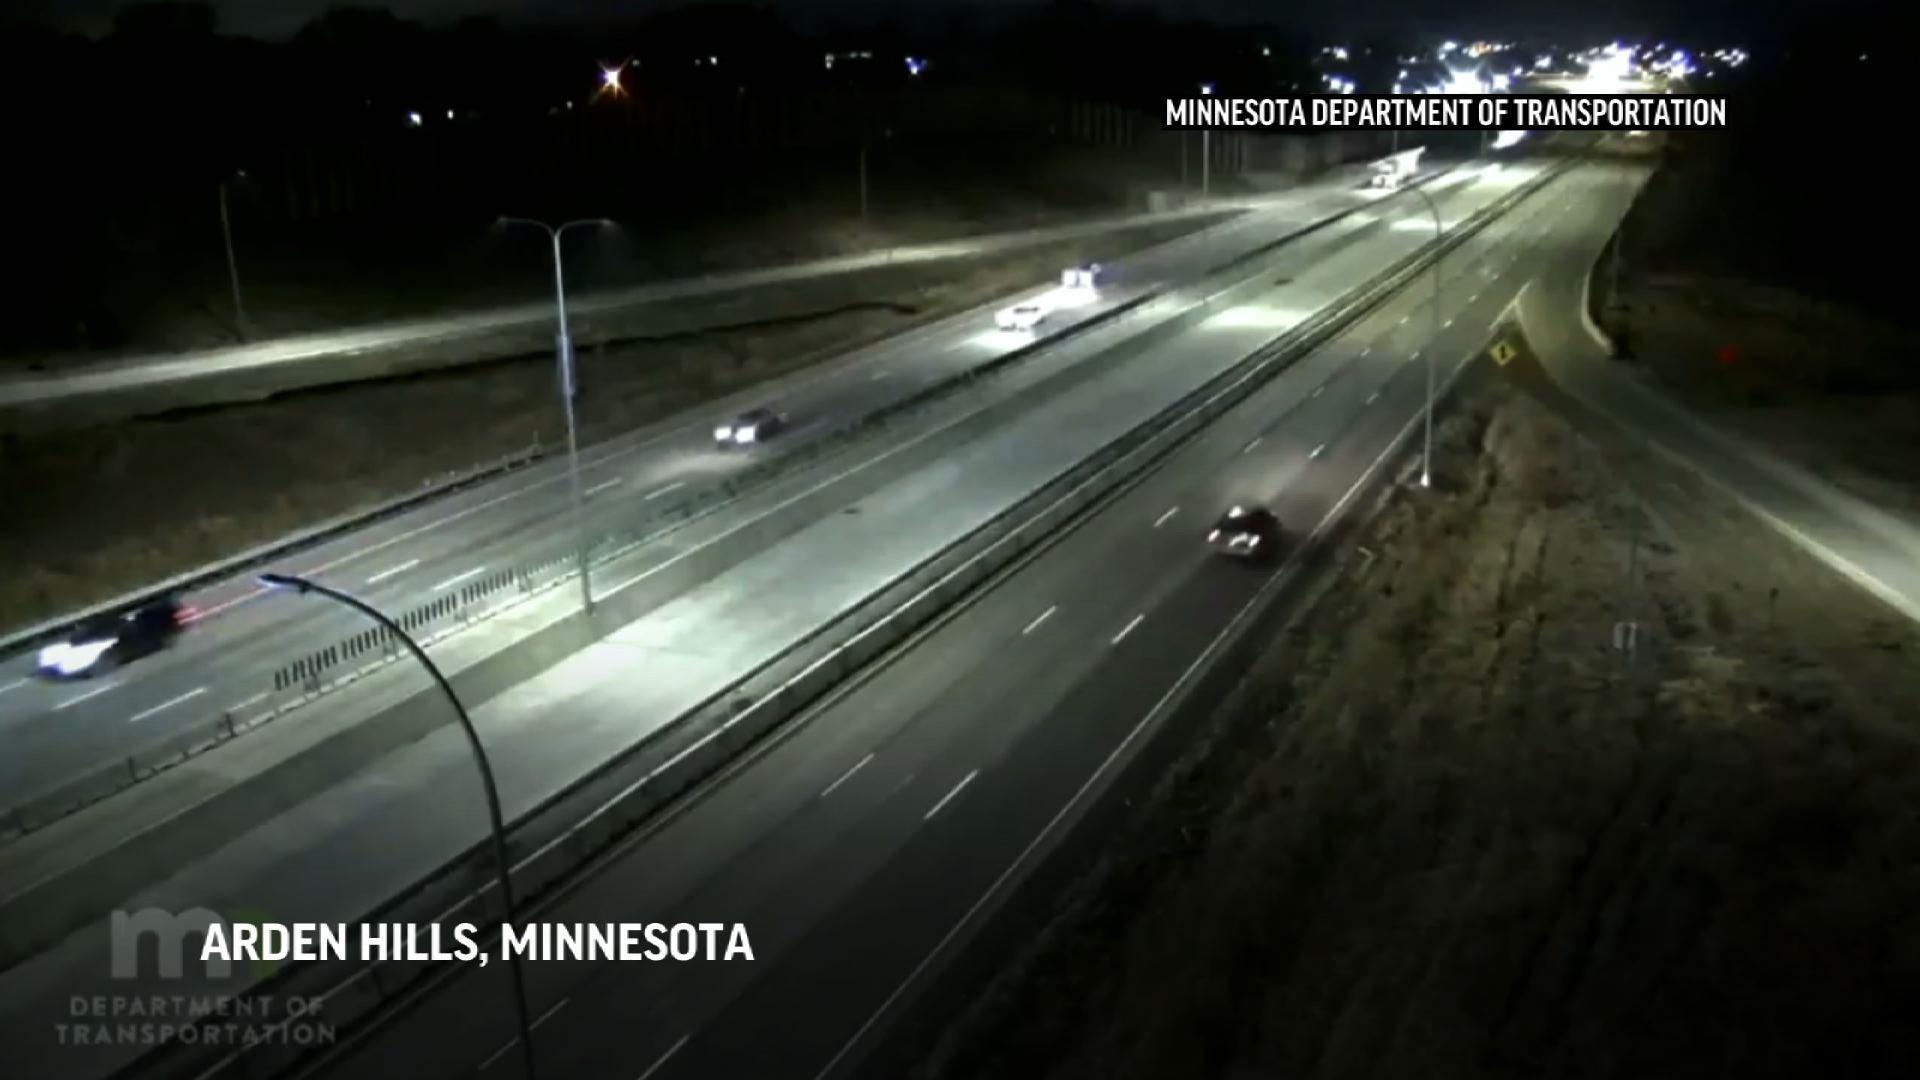 Small plane makes emergency landing on Minnesota highway hitting vehicle